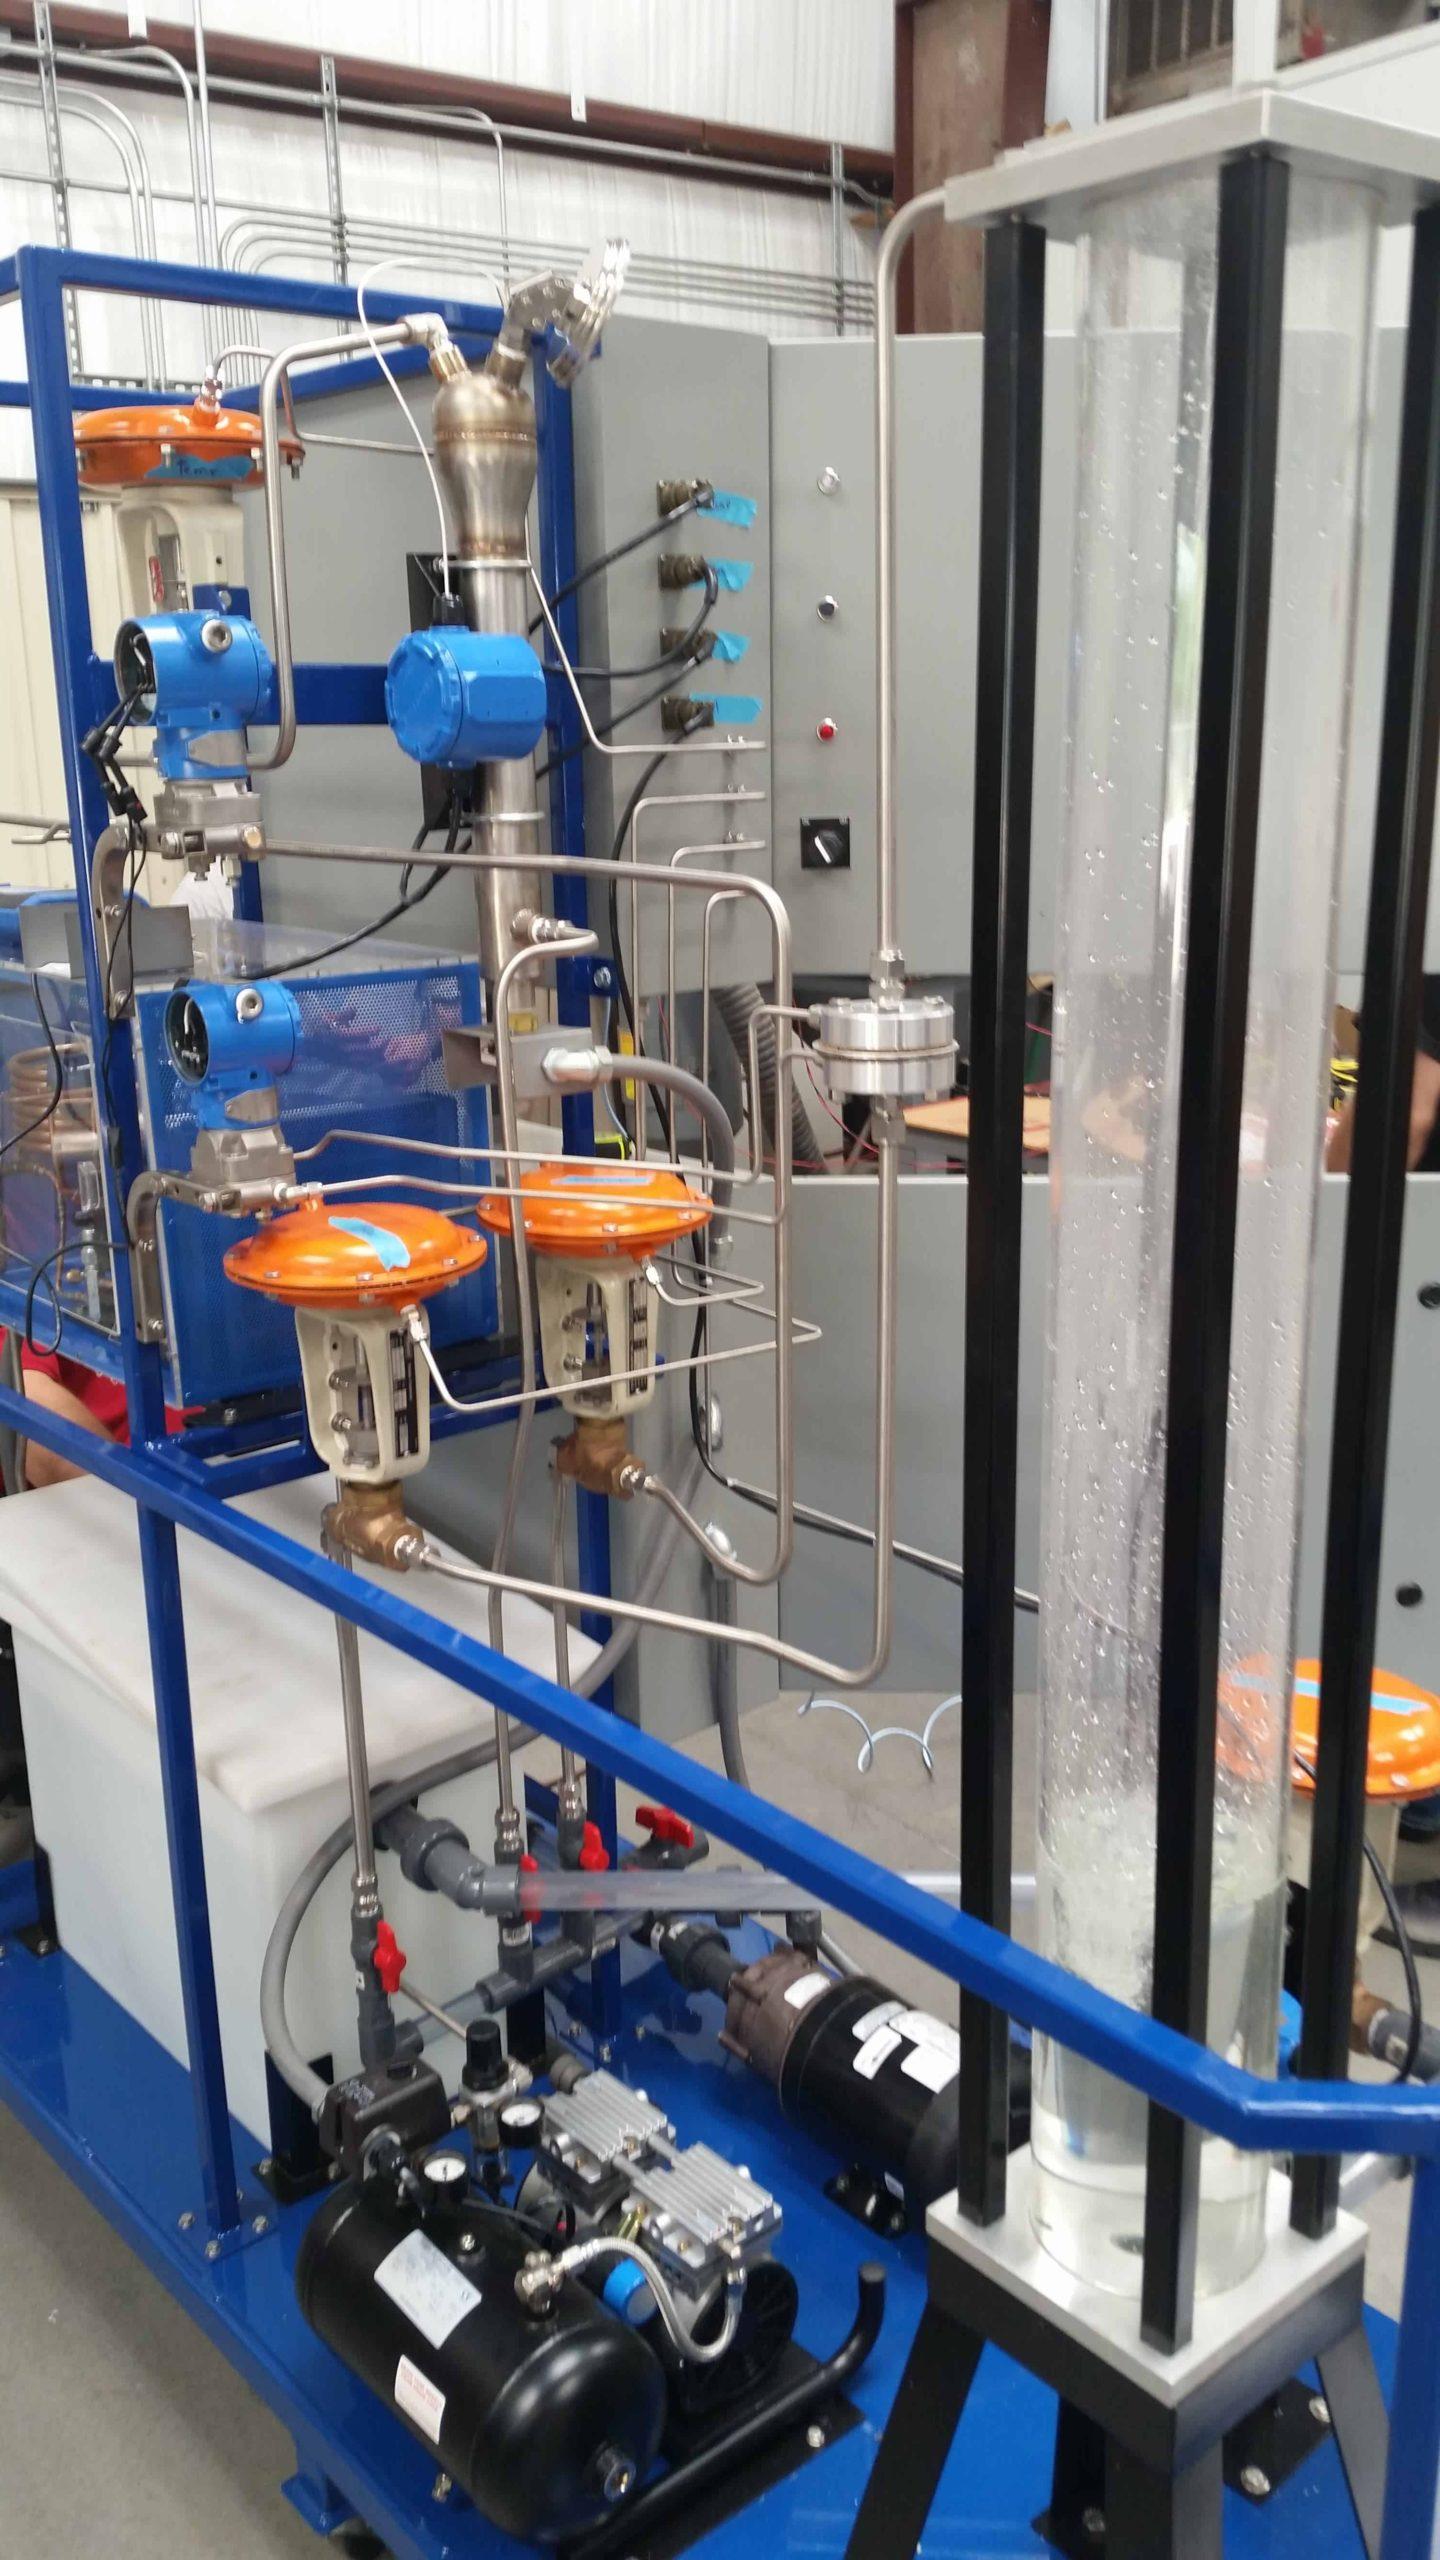 Bayport Technical | 120-IPT Instrumentation Process Trainer